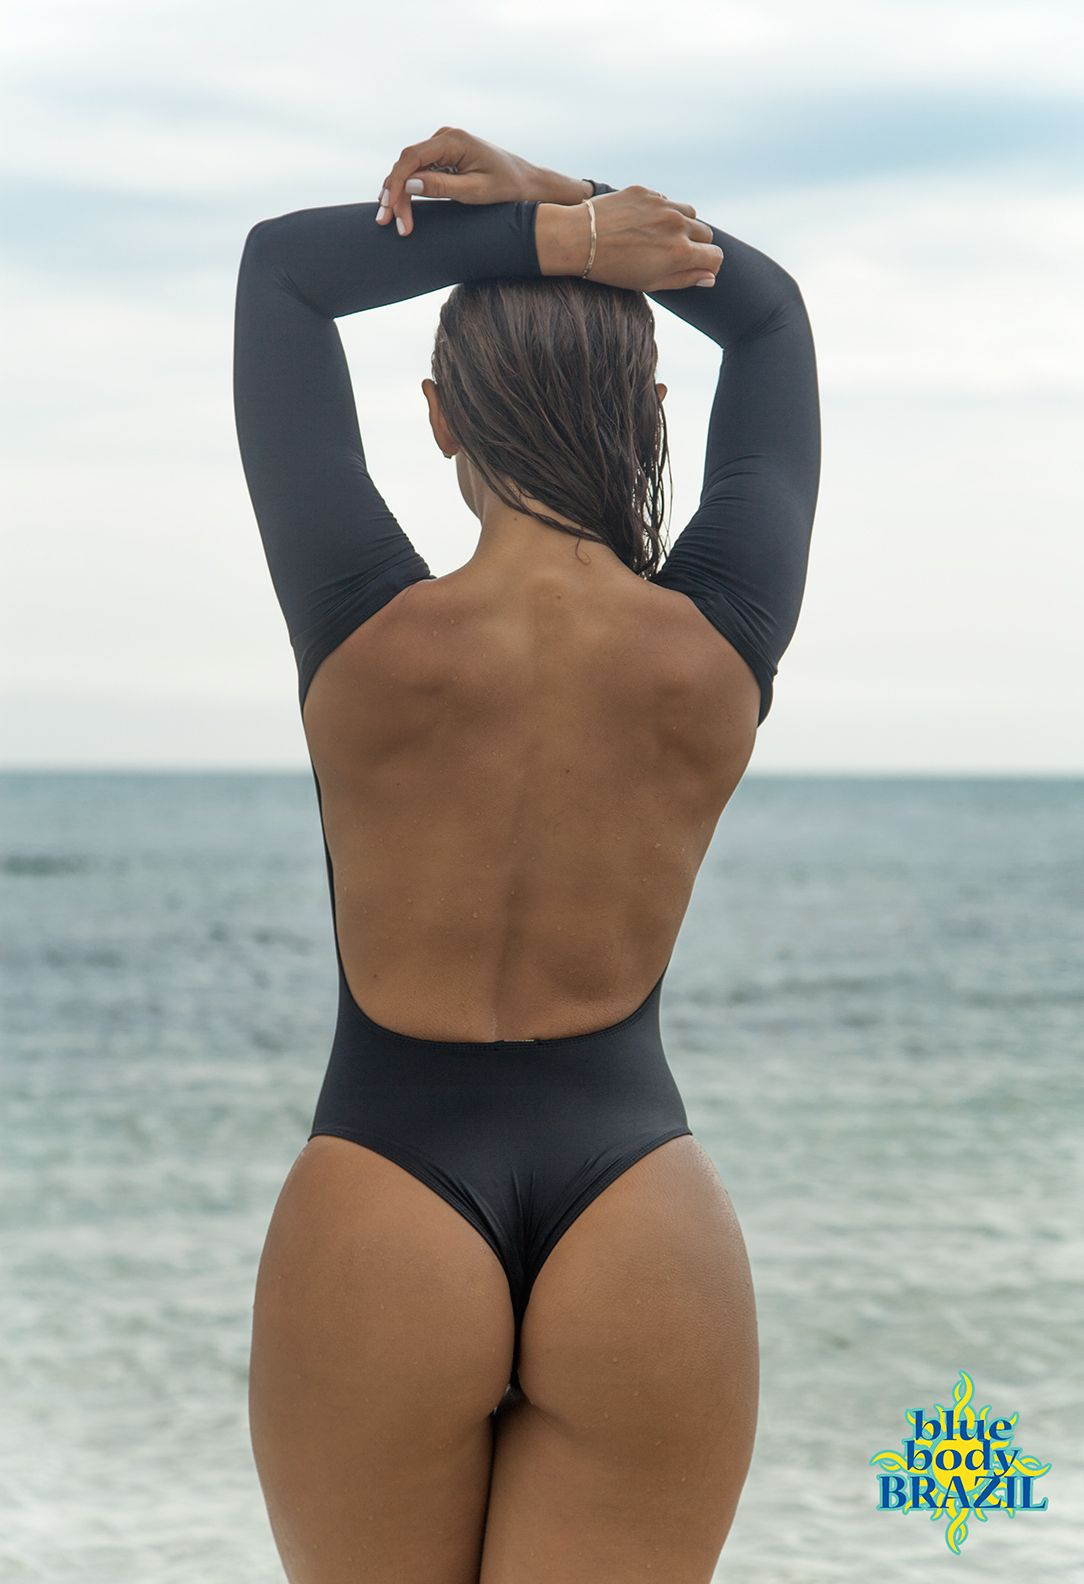 Tianna Gregory Hd Wallpaper Blue Body Brazil Nicole Mejia Nicole Mejia Pinterest